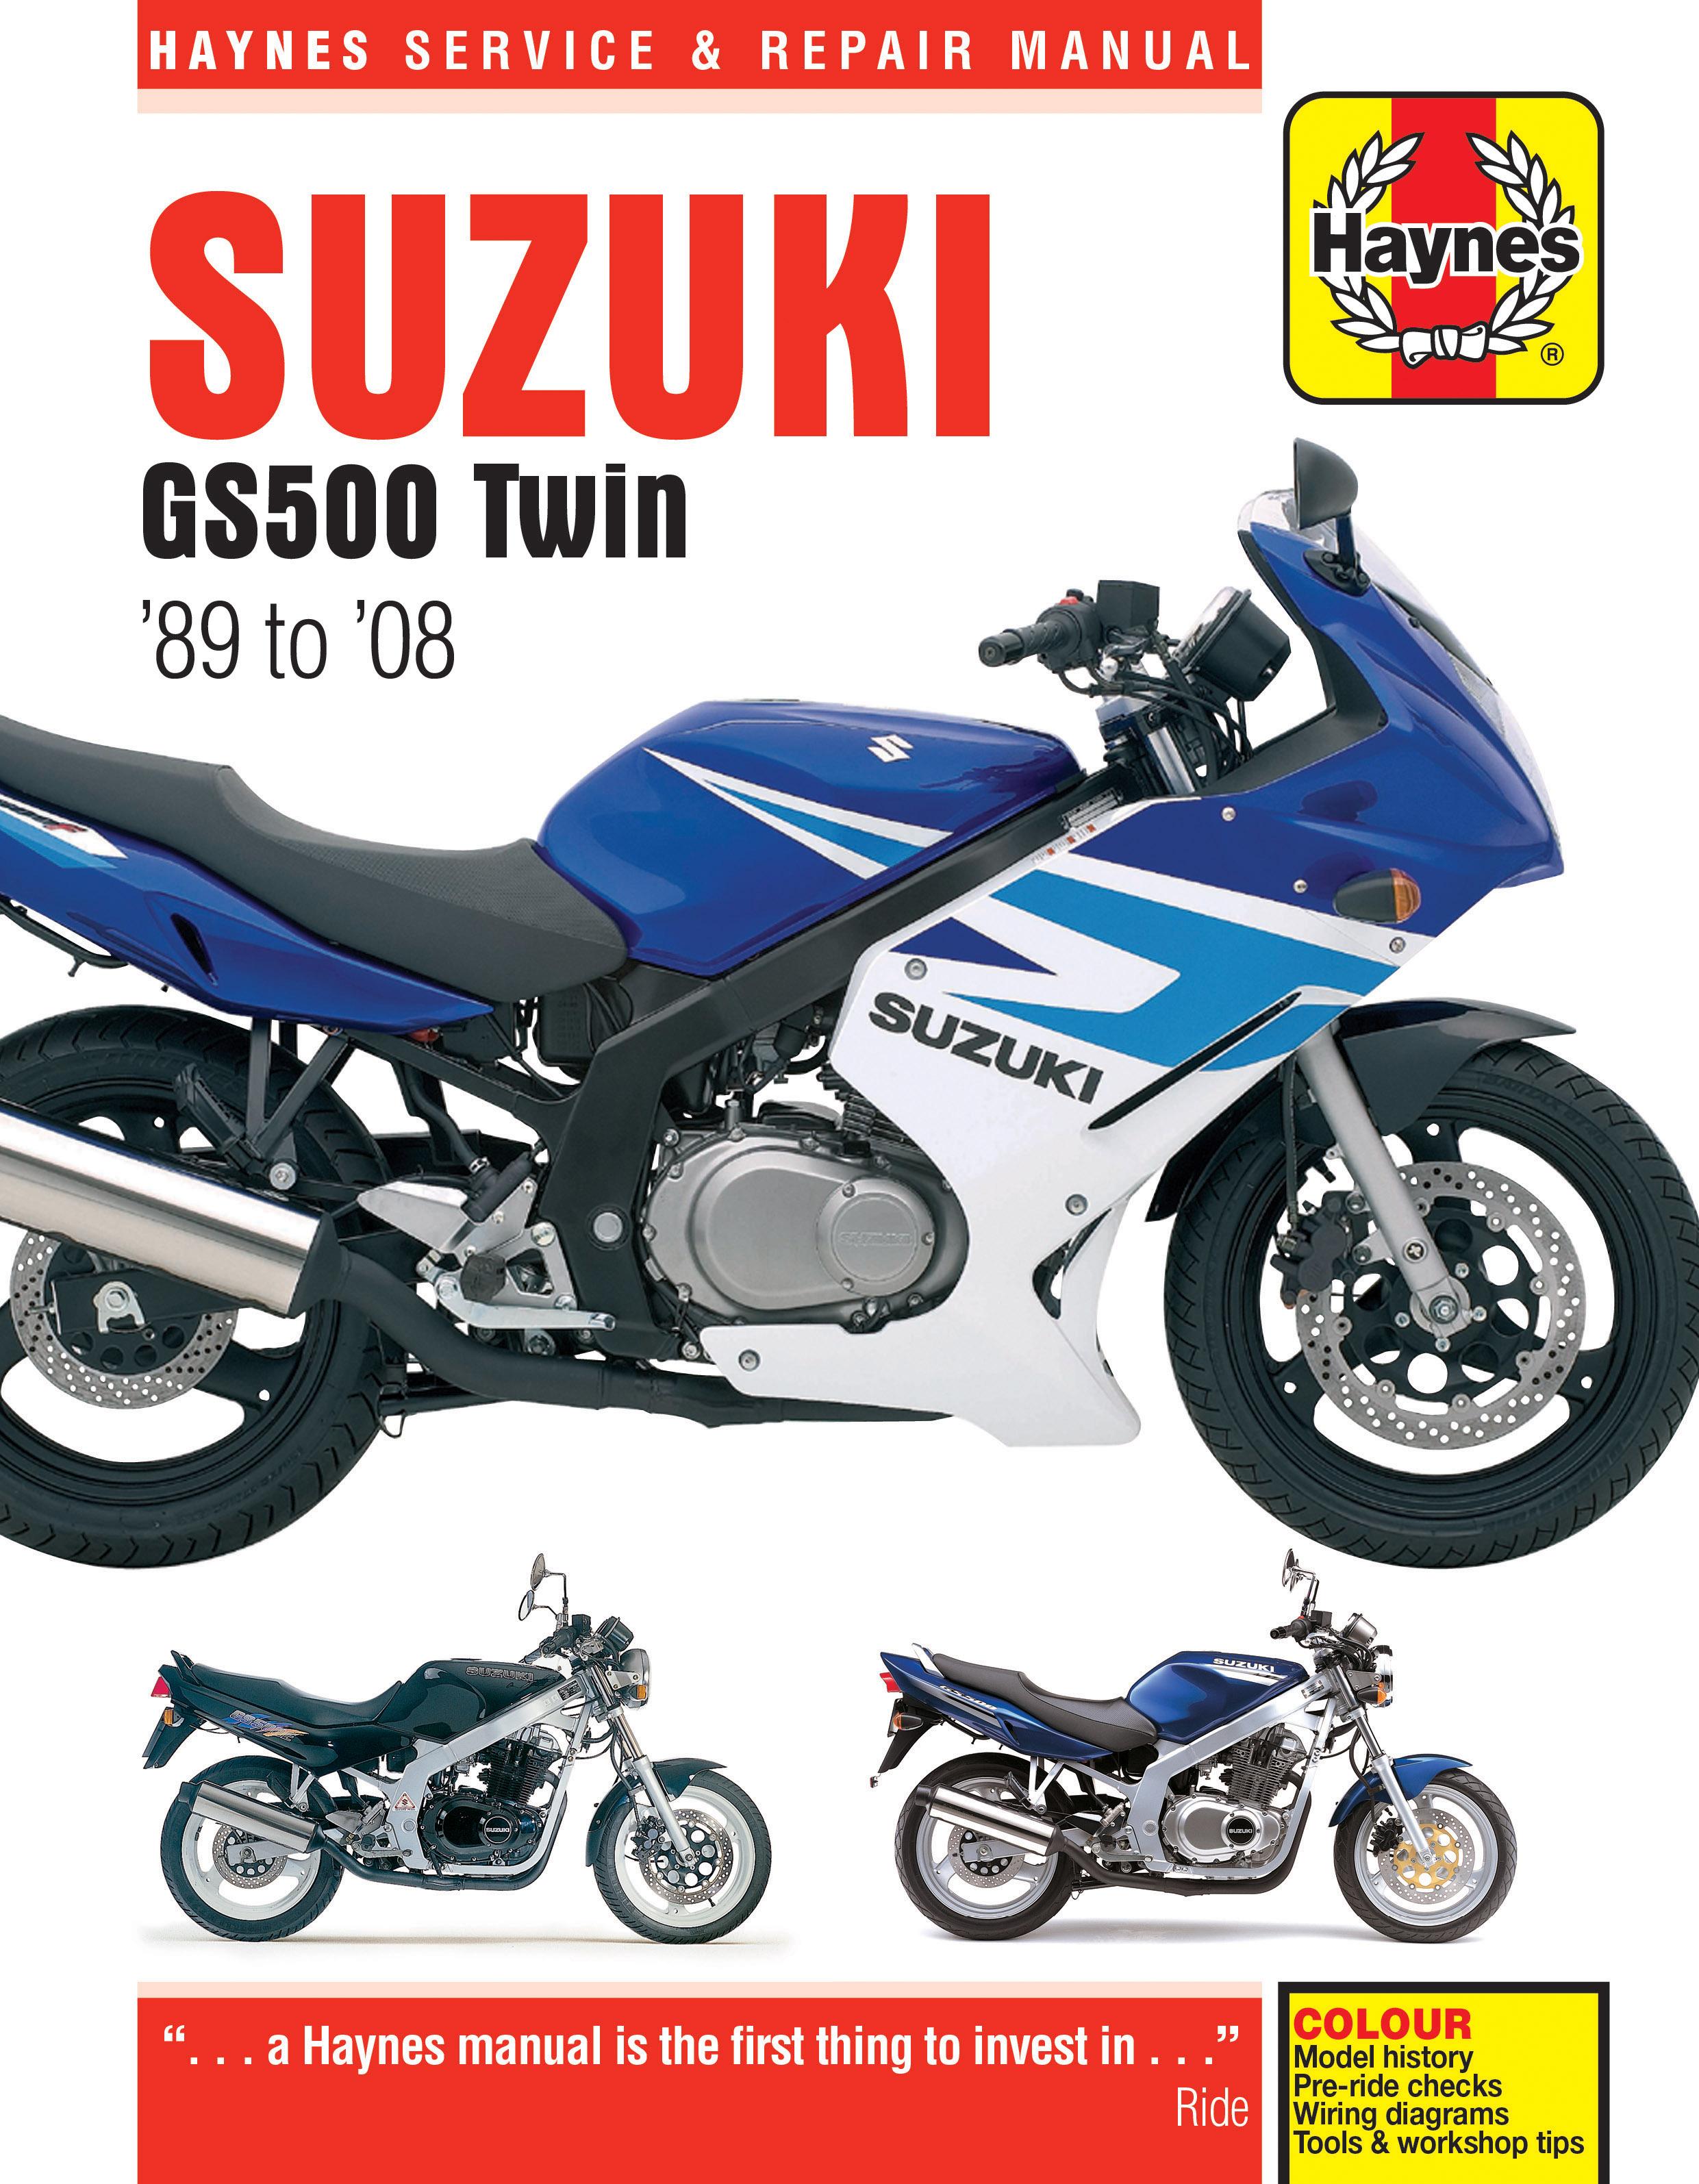 2005 Gs500 Wiring Diagram Reveolution Of 89 Softail Suzuki Twin 08 Haynes Repair Manual Publishing Rh Com Carburetor